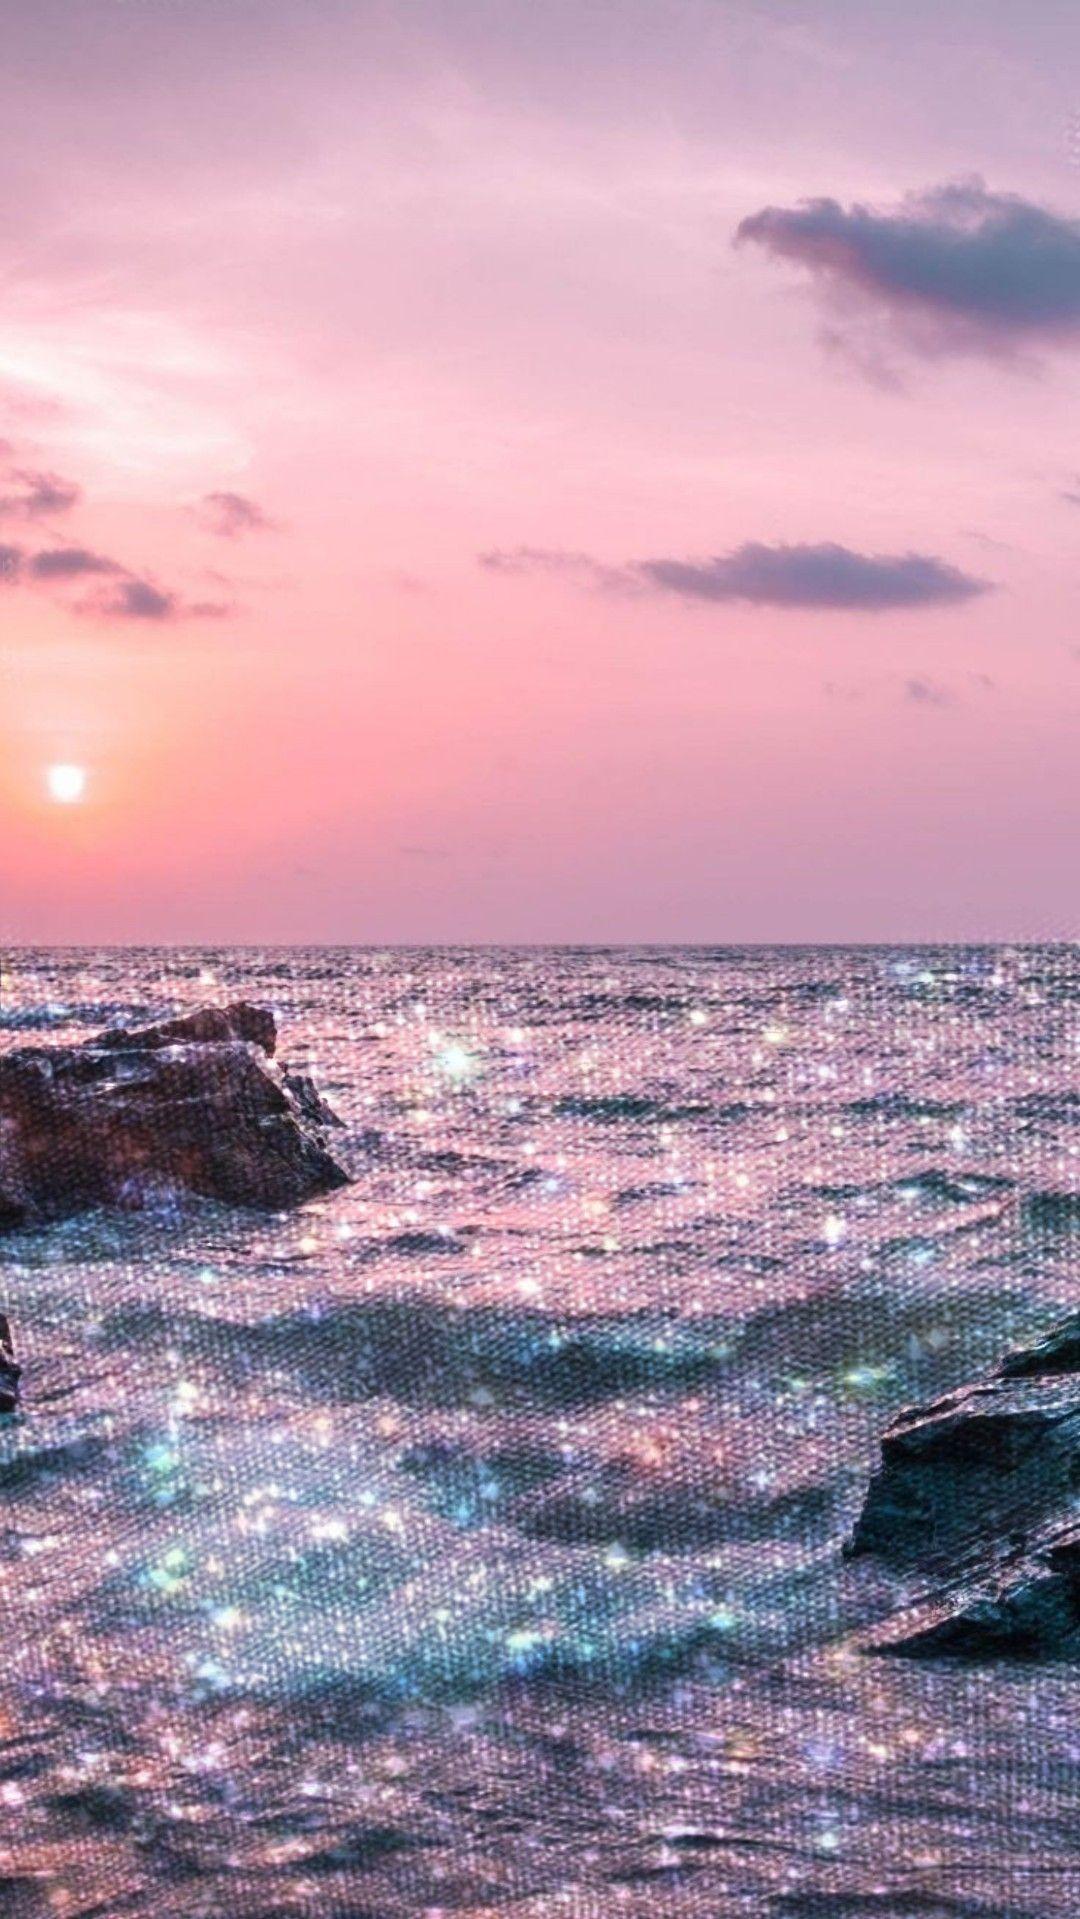 Sea Glitter Effect Aesthetic Wallpapers Aesthetic Pastel Wallpaper Aesthetic Iphone Wallpaper